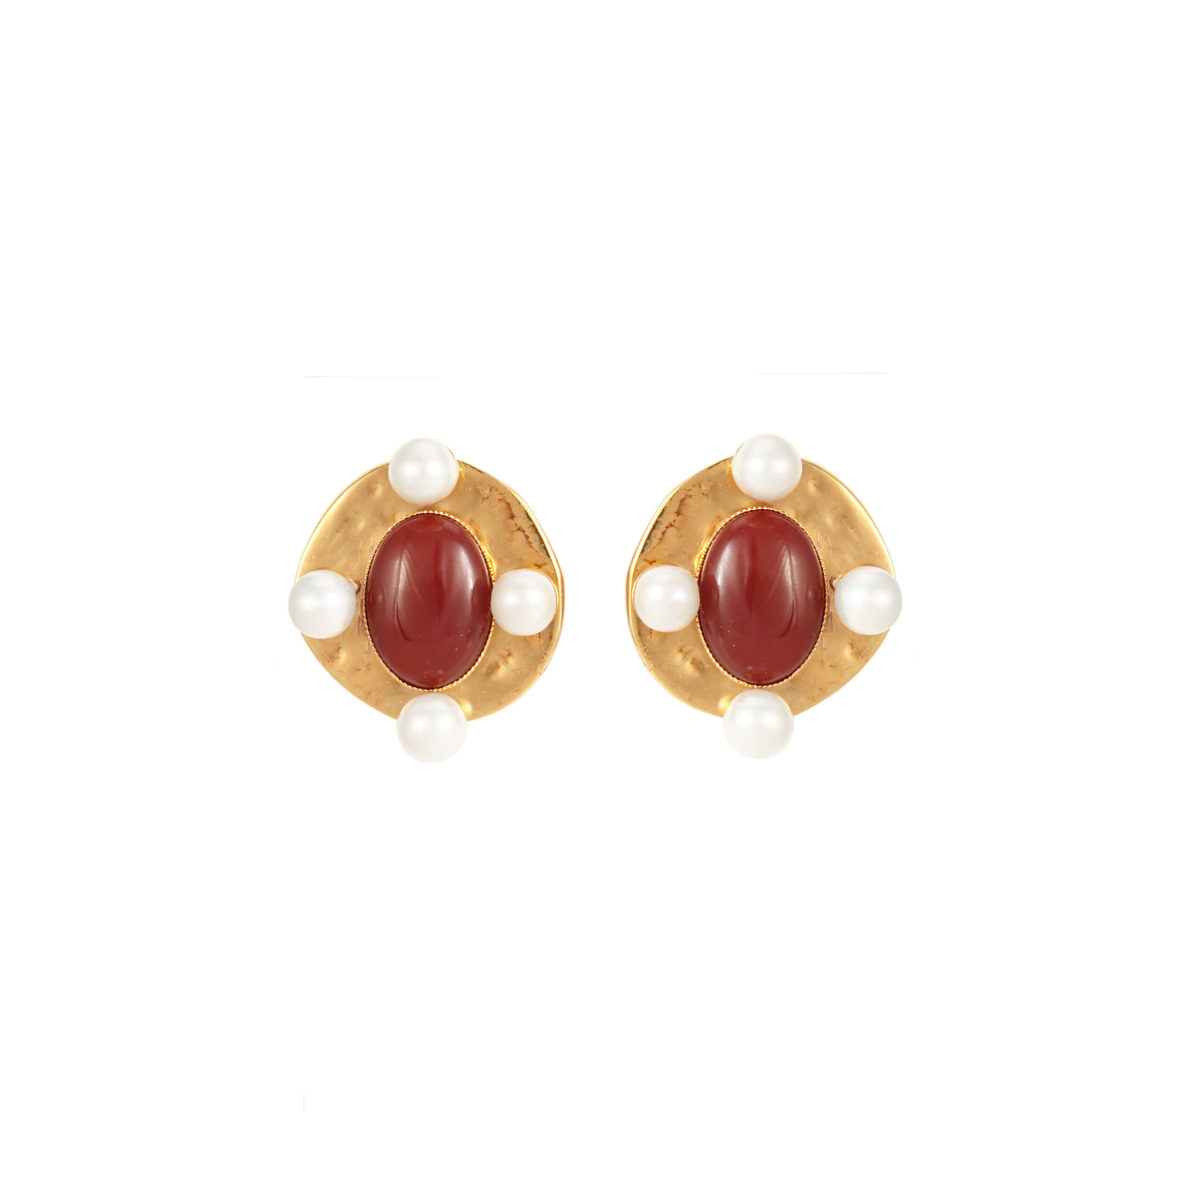 Boucles d'oreilles clips TOPKAPI TOP104-col1 packshot